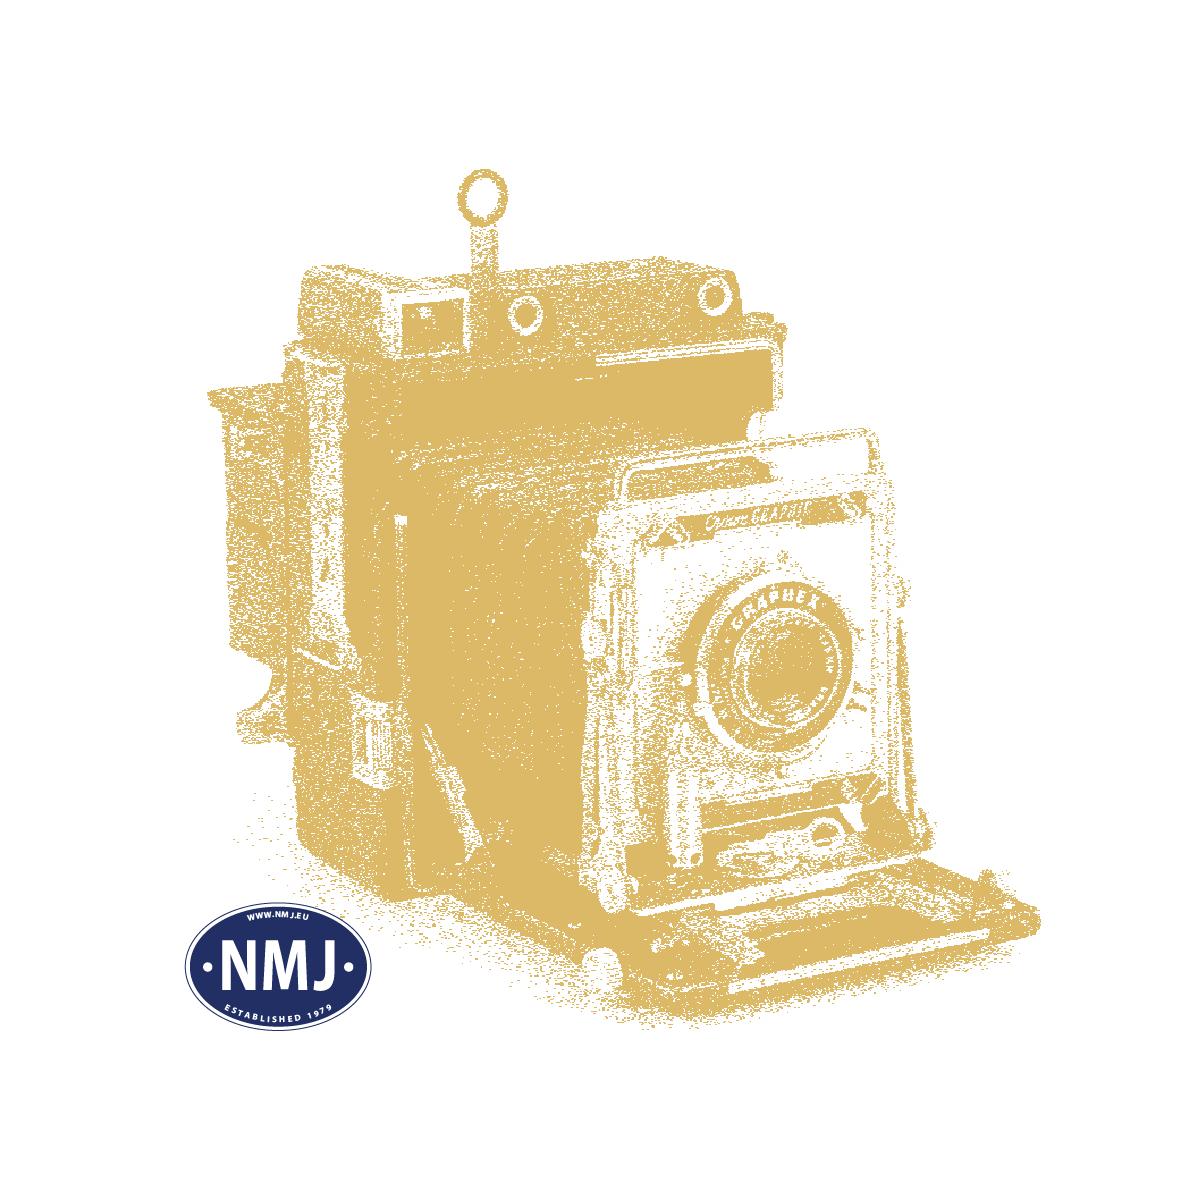 "NMJT90010 - NMJ Topline NSB Di3a 607 ""Nohab"", Mellomdesign, DCC m/ Lyd"